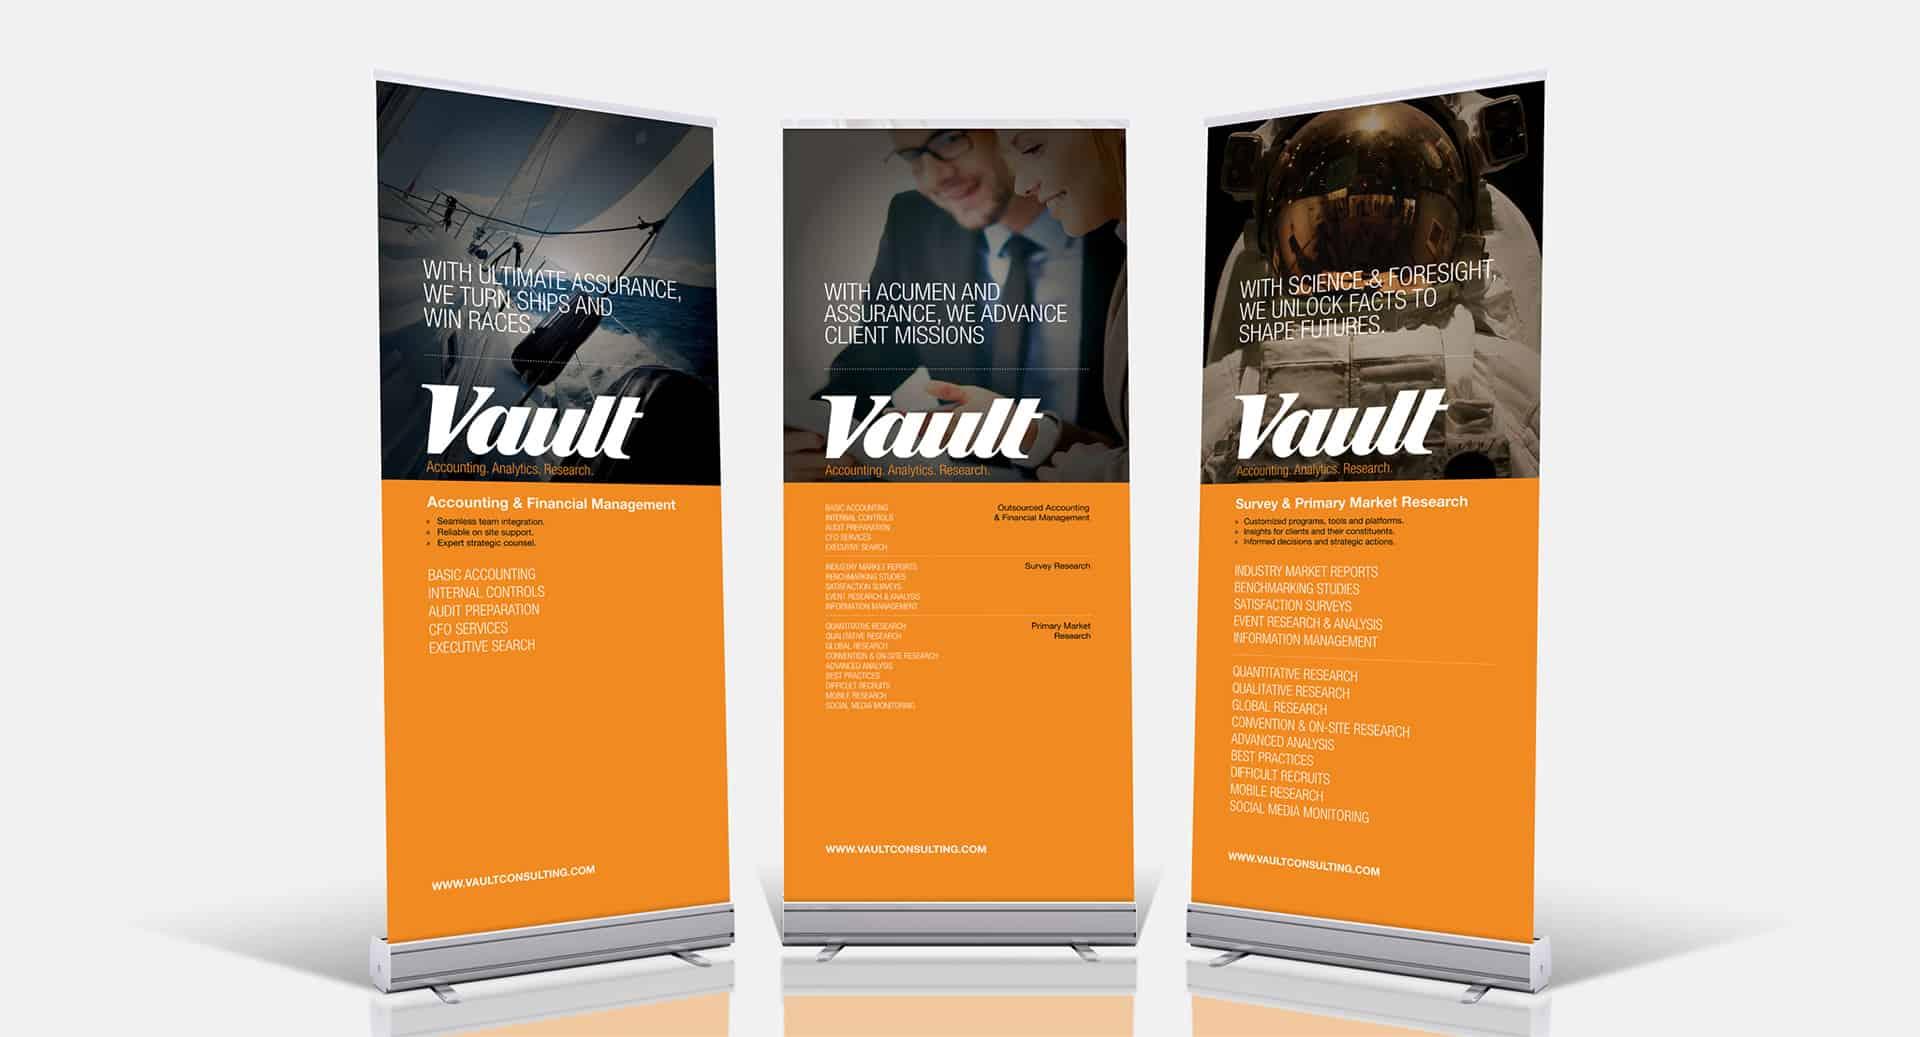 vault-banners-halfwidth